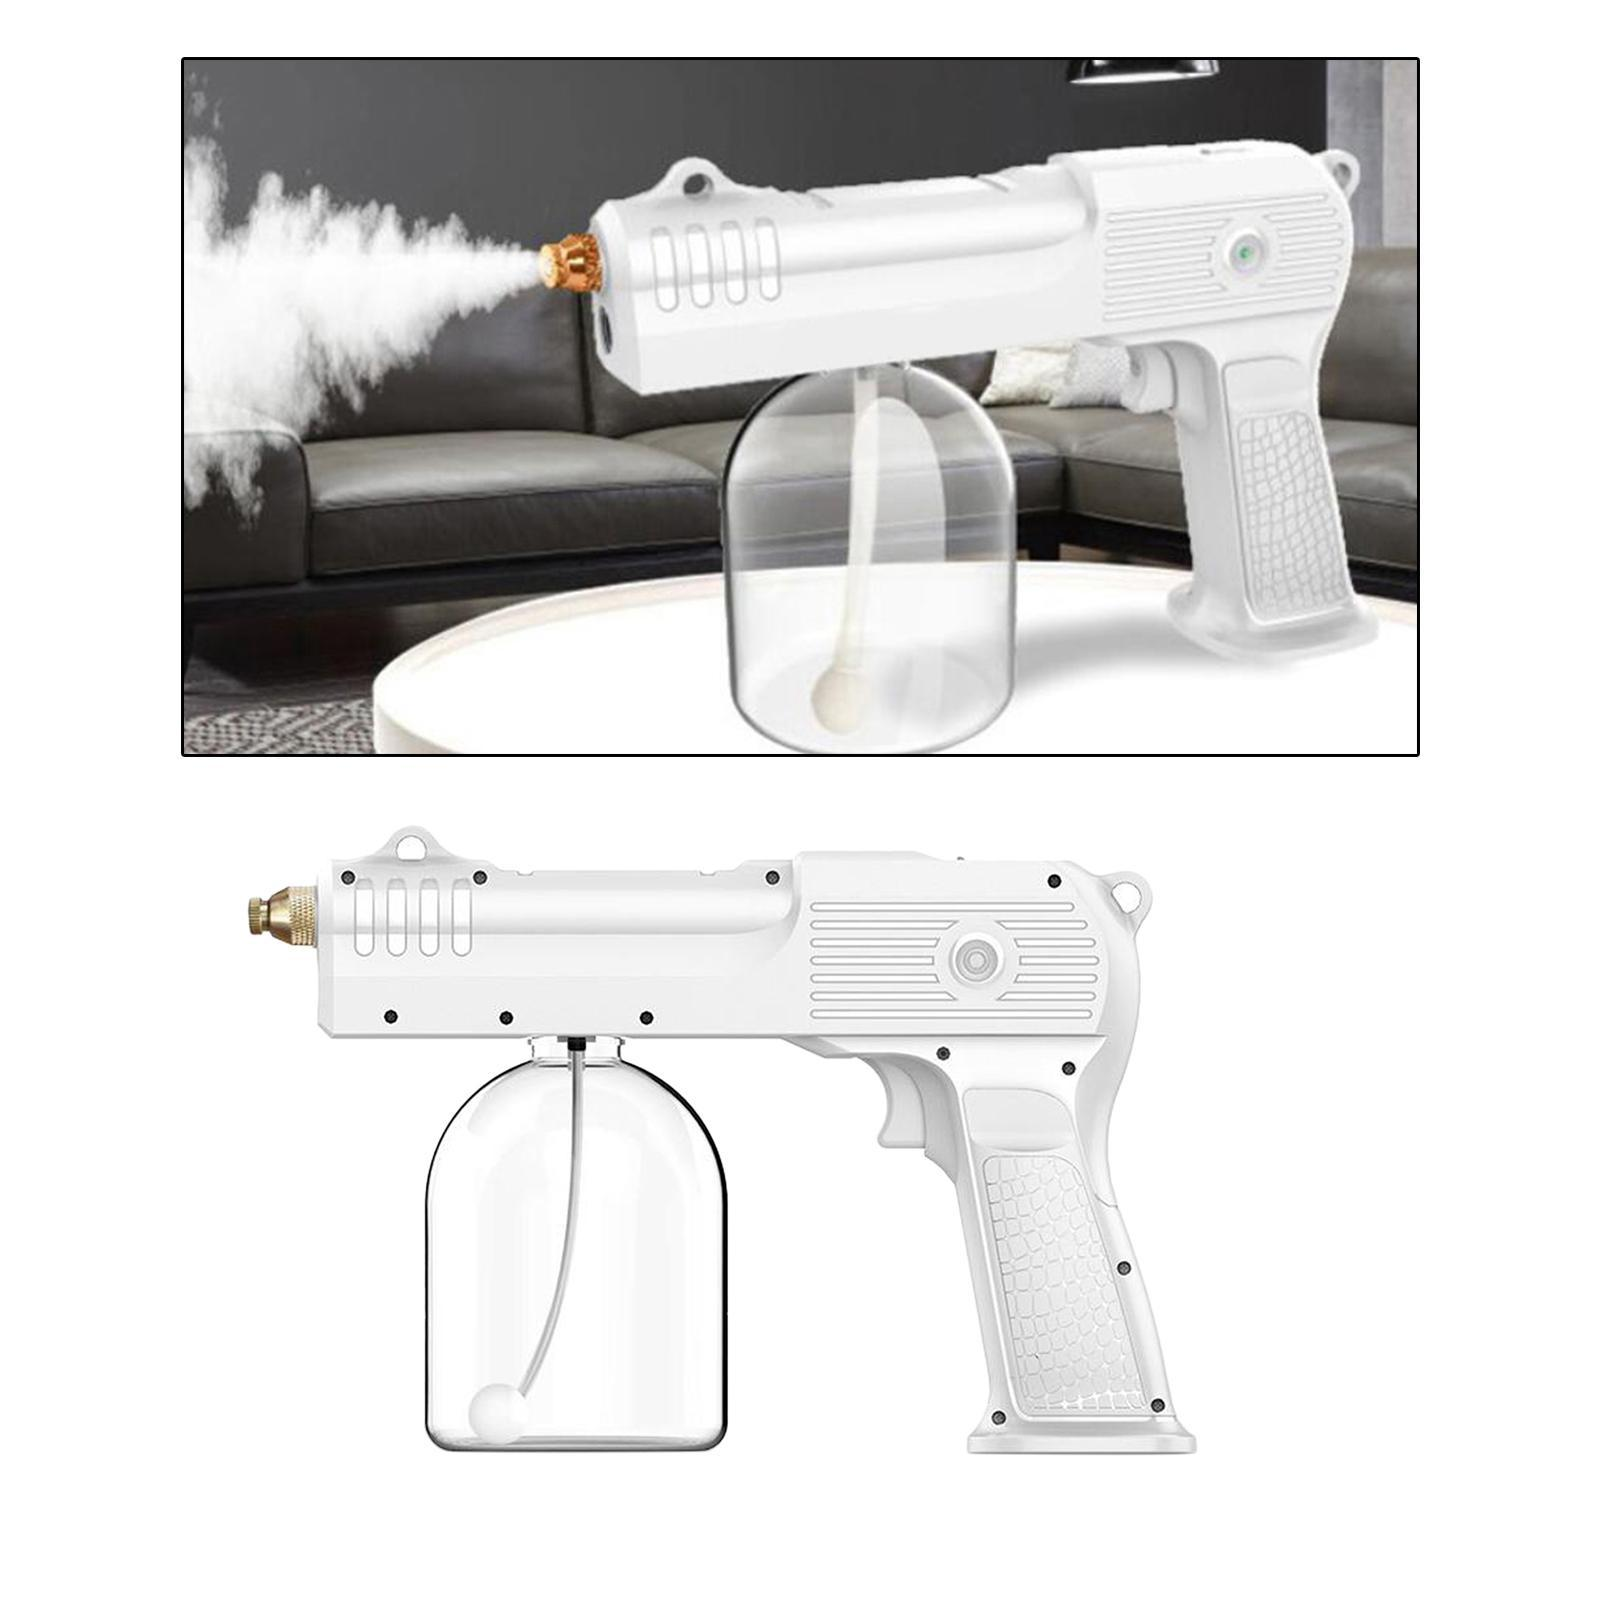 miniature 9 - USB Sanitizer Sprayer 500ml Disinfectant Fogger Mister Spray Gun Portable